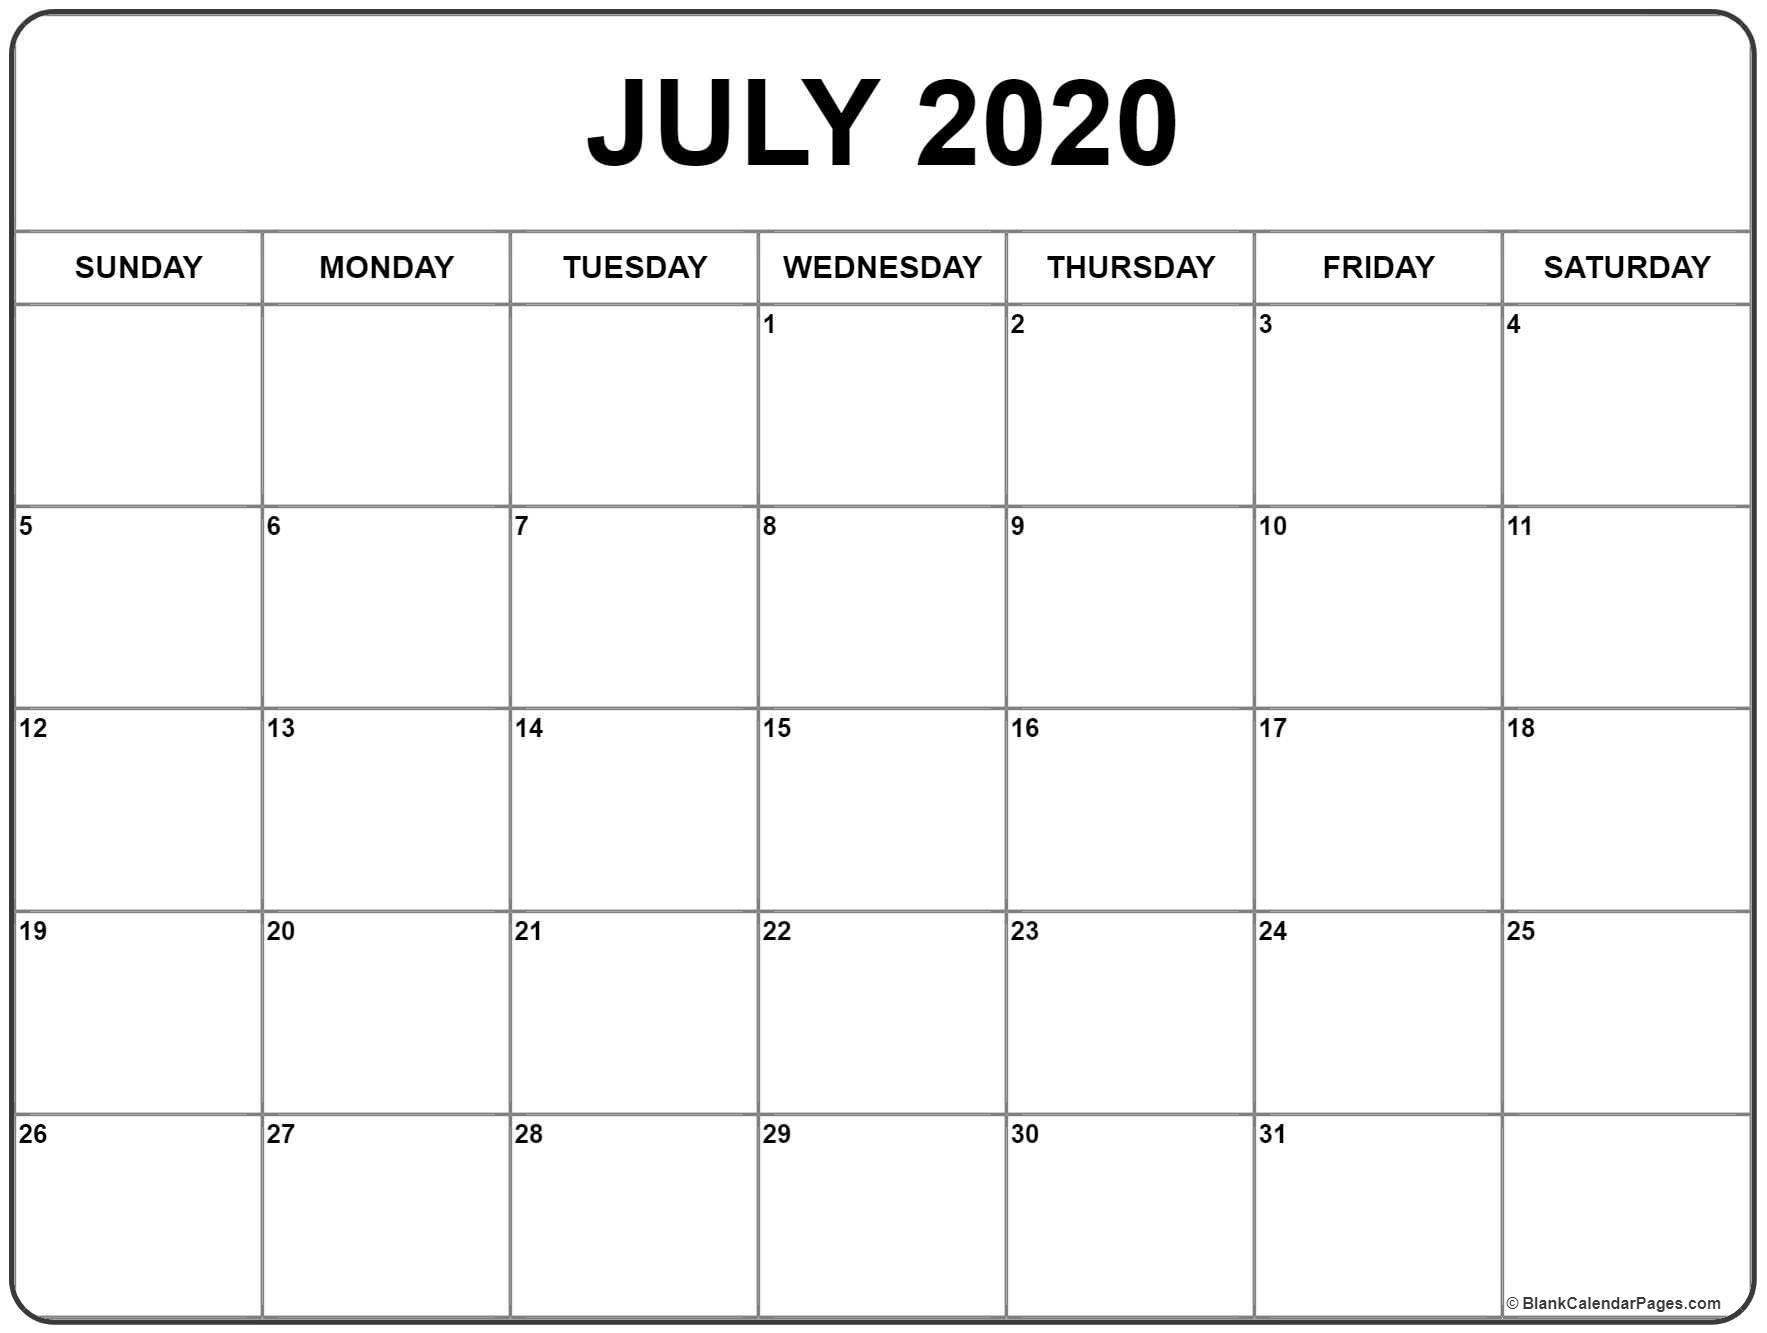 July 2020 Calendar Printable July 2020 Calendar | Get Free